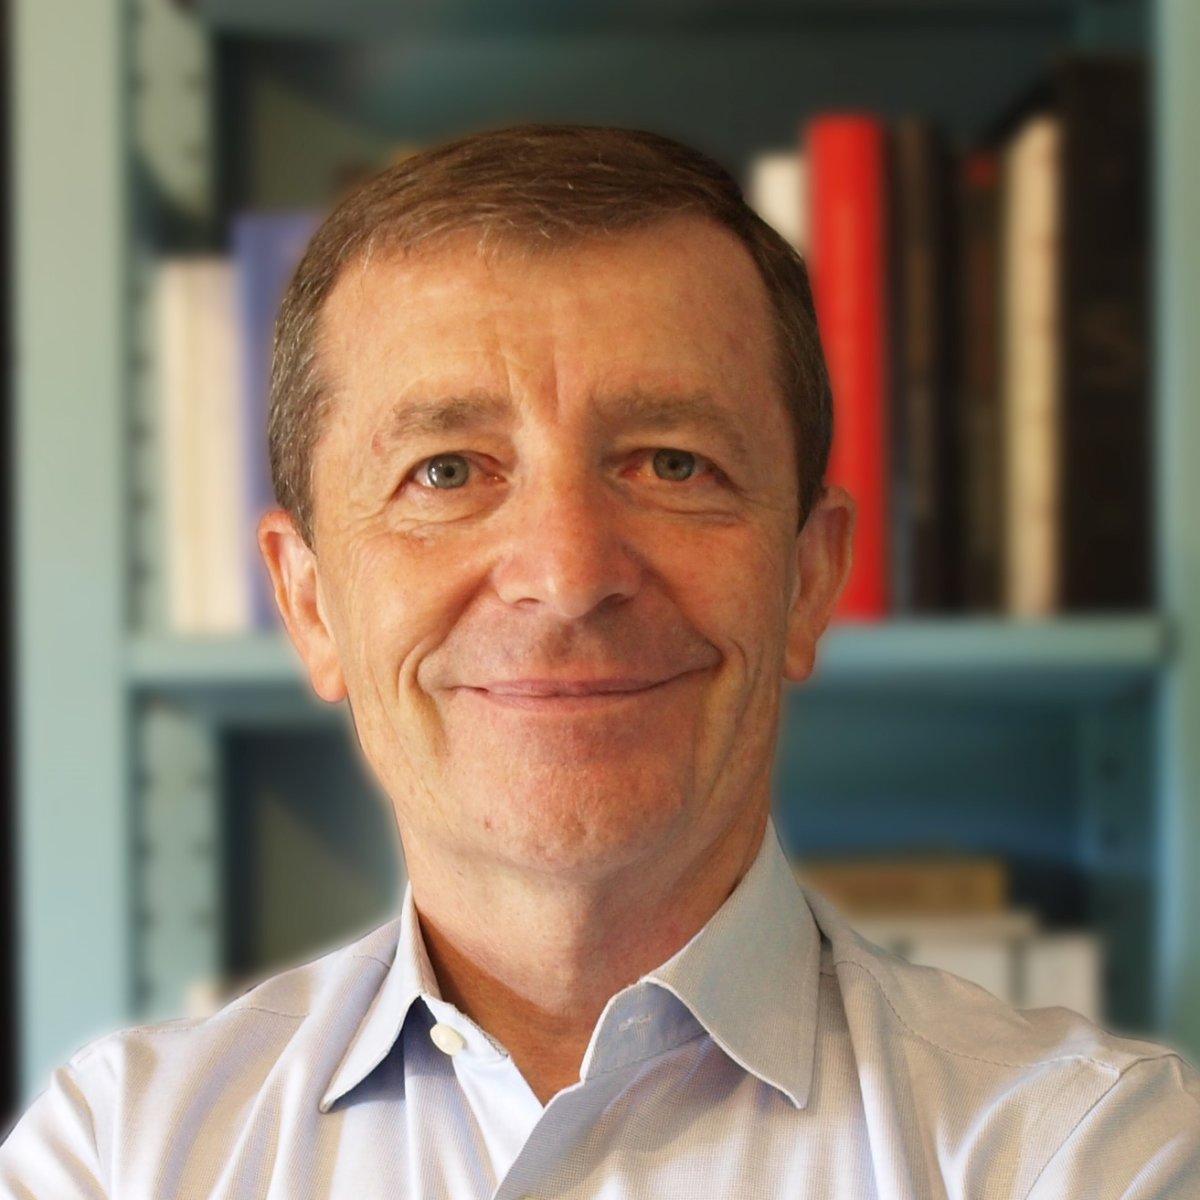 Massimo Santambrogio